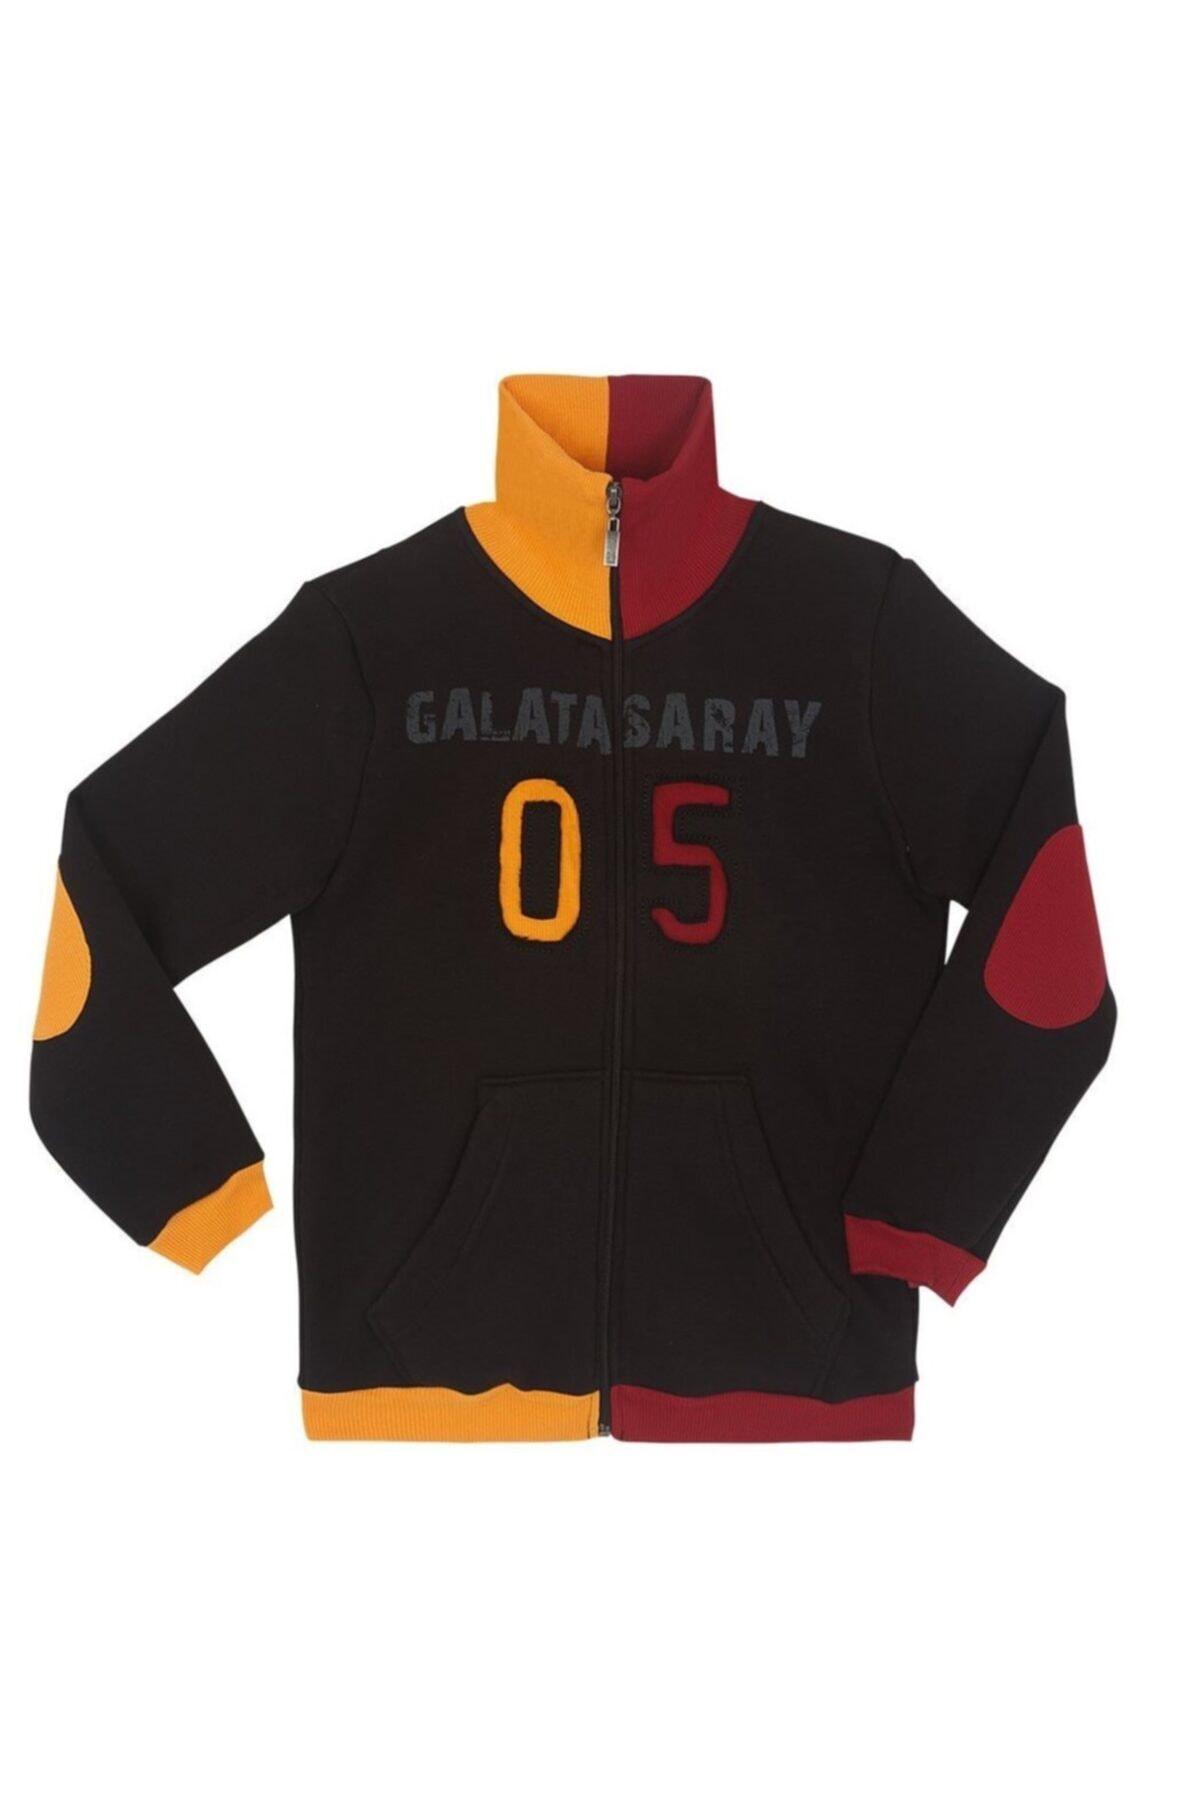 Galatasaray Forma-c13318 Ceket Syh